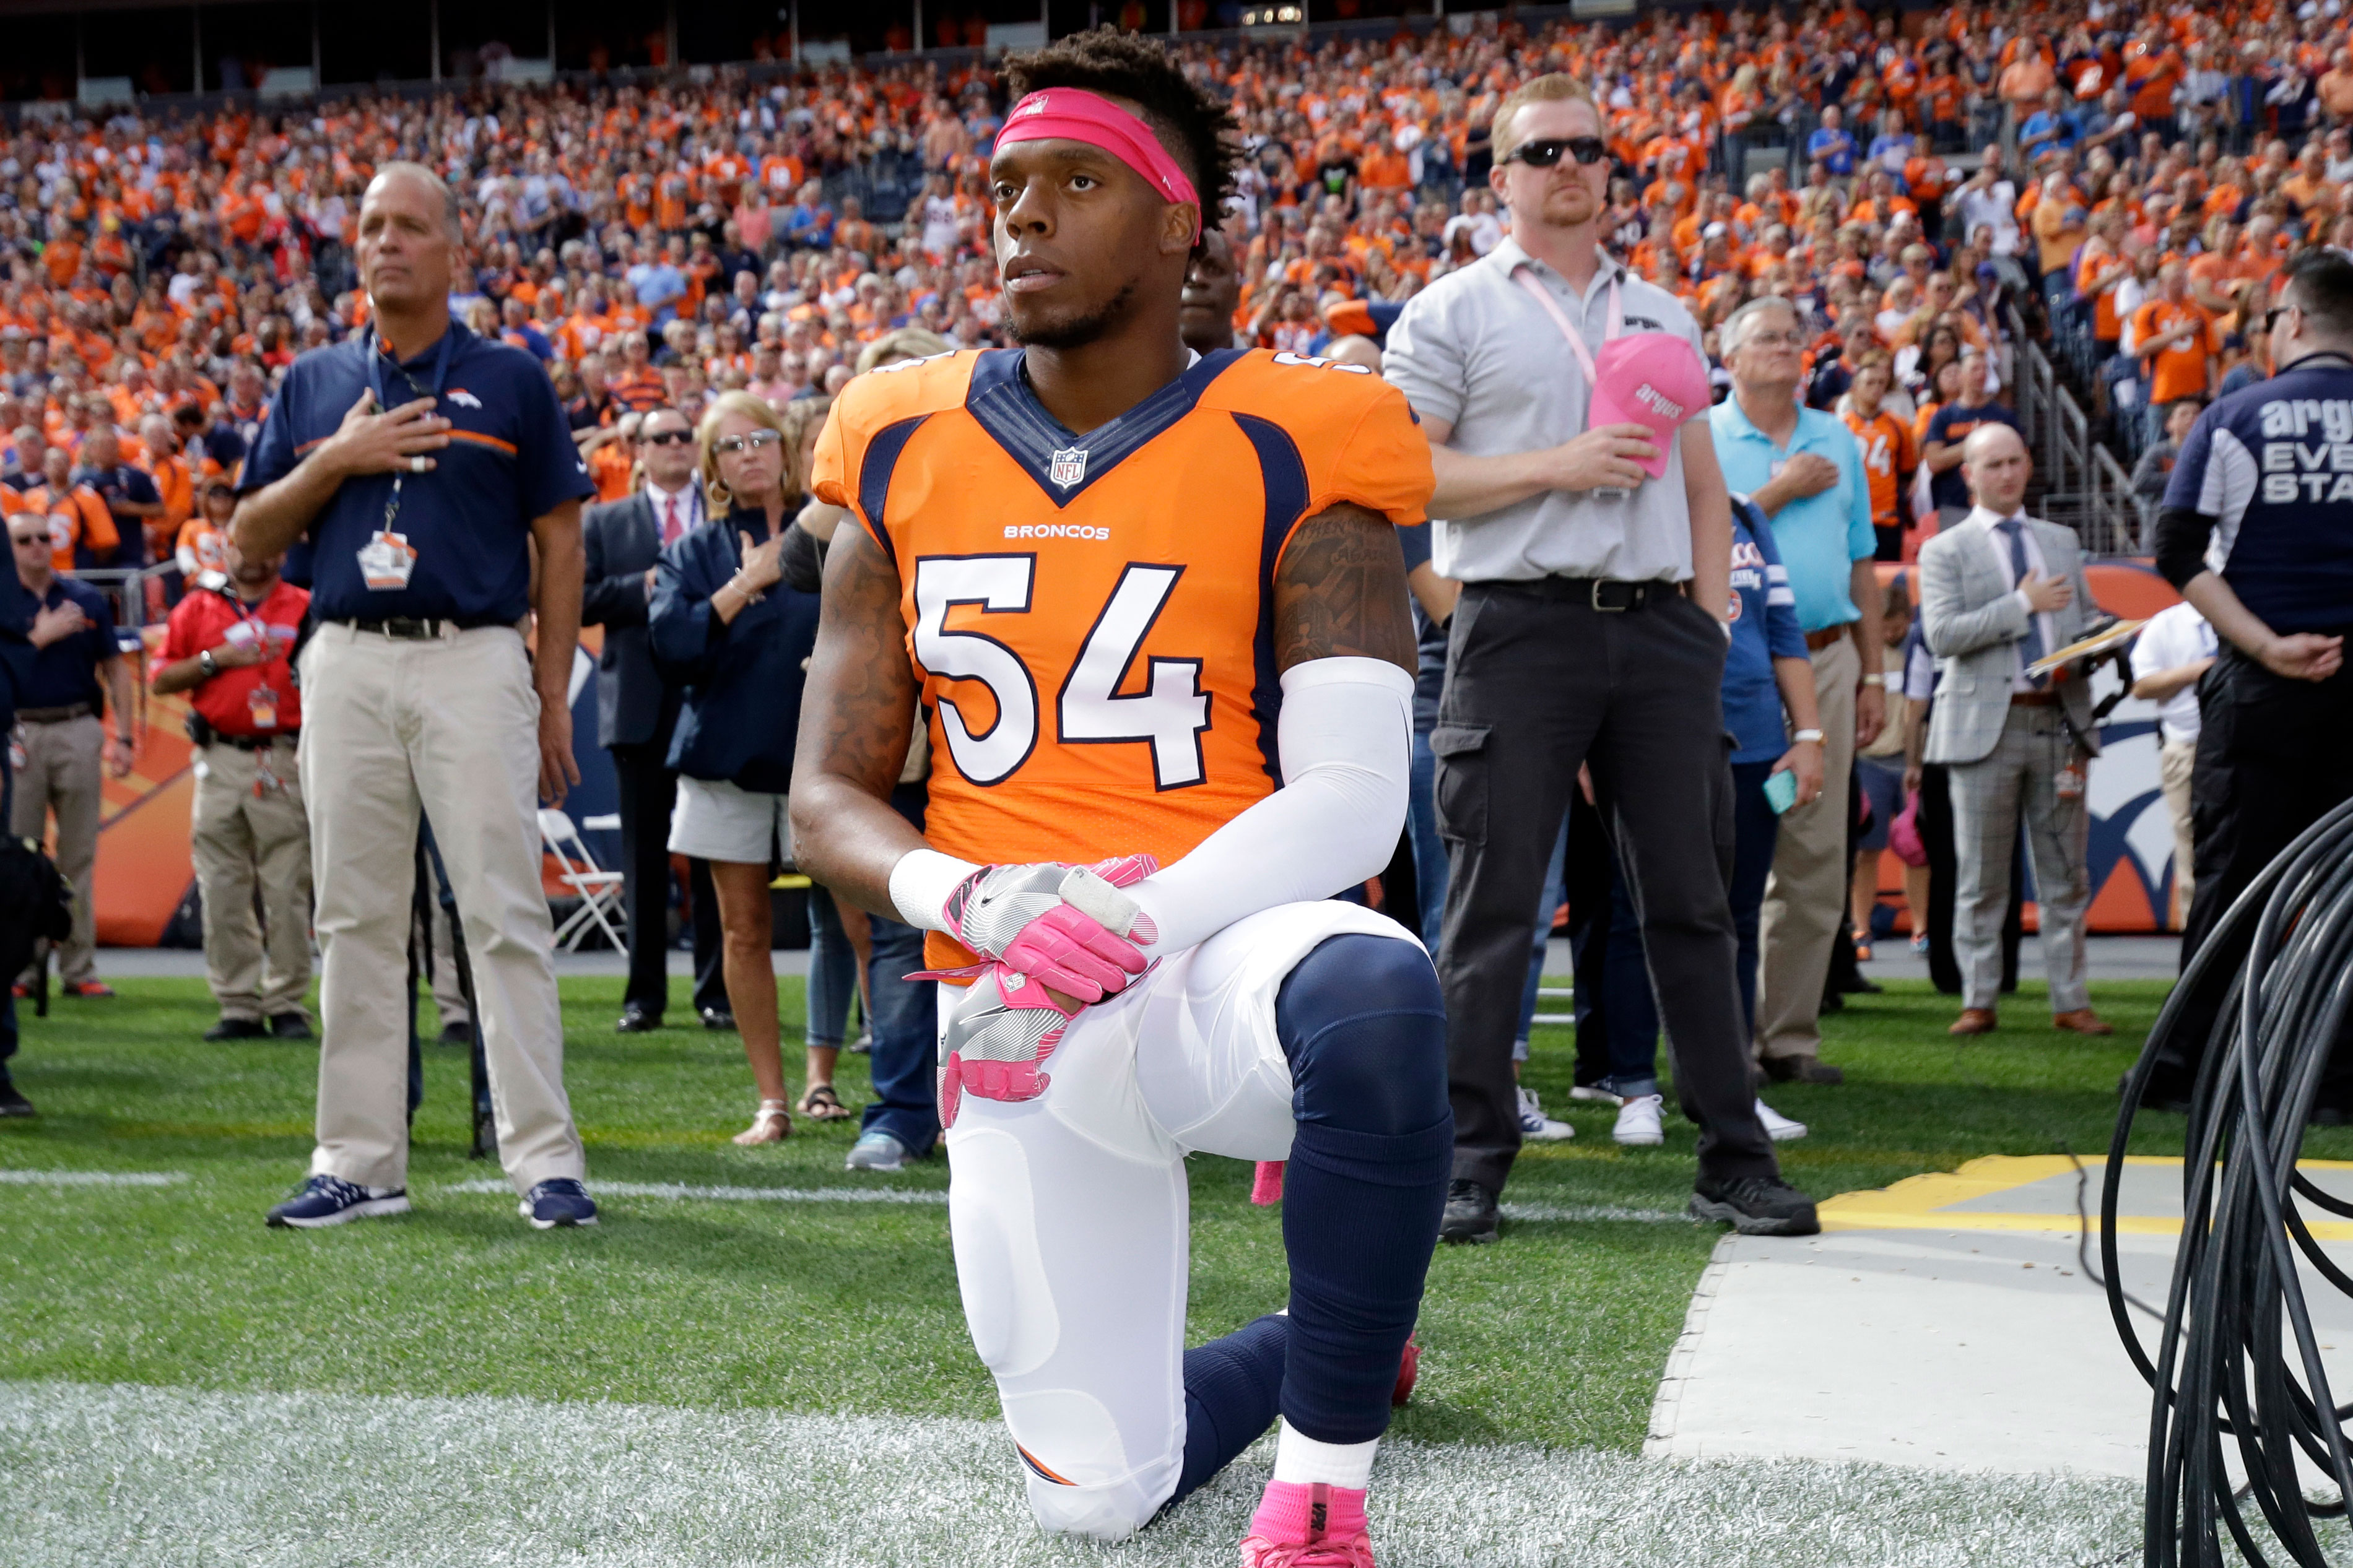 Photo: NFL Anthem Kneeling | Broncos Brandon Marshall - AP